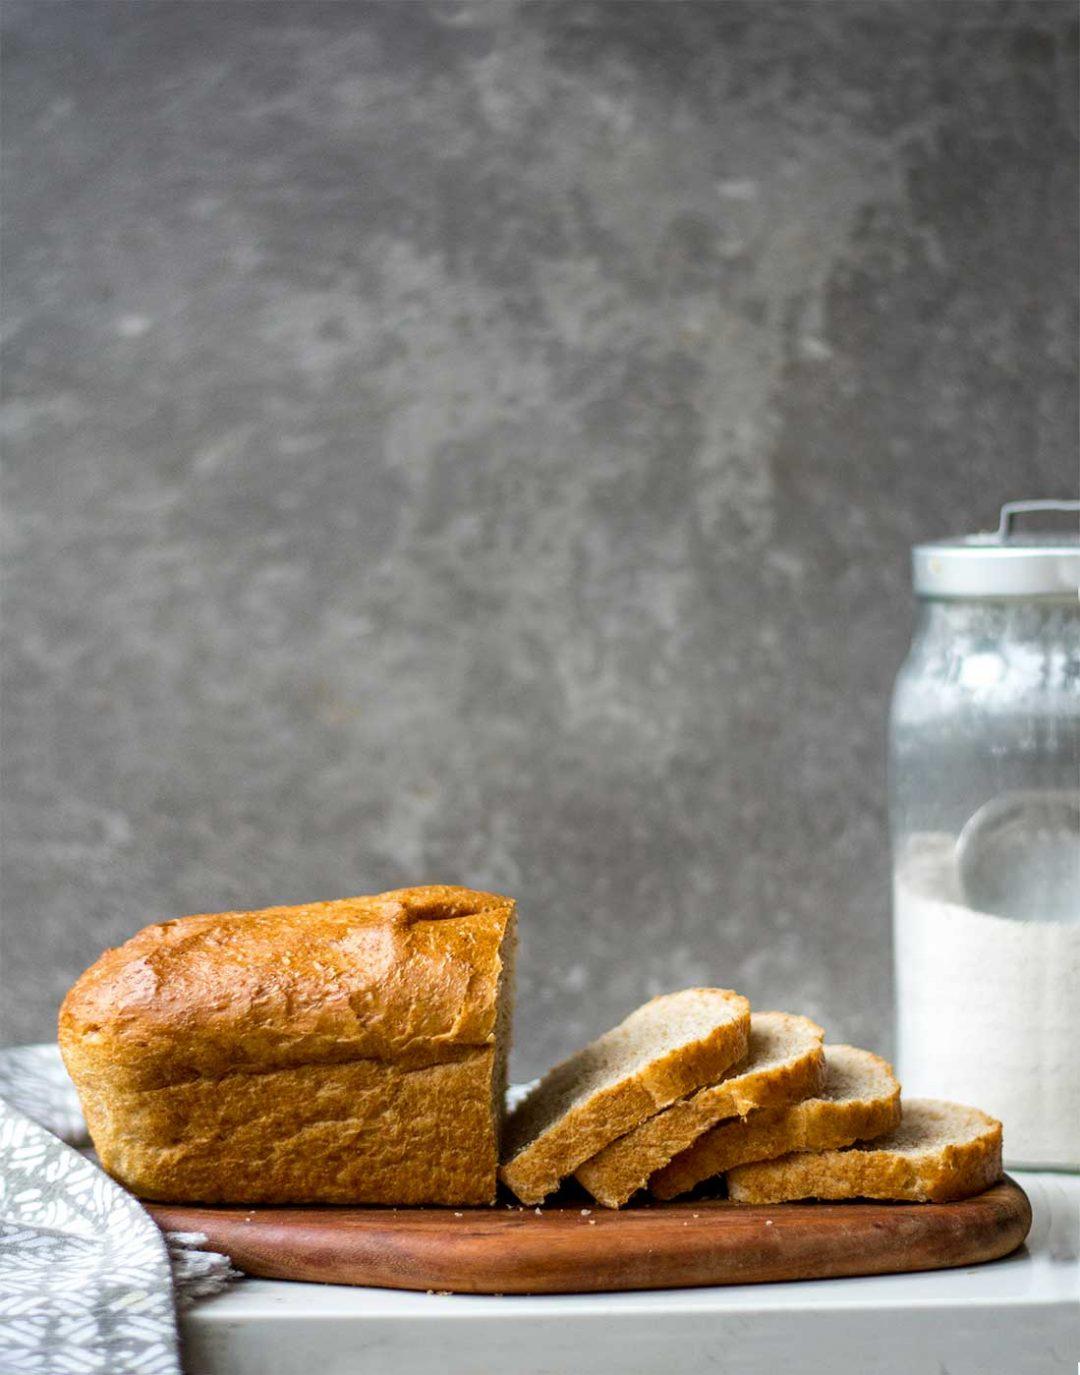 sliced bread side